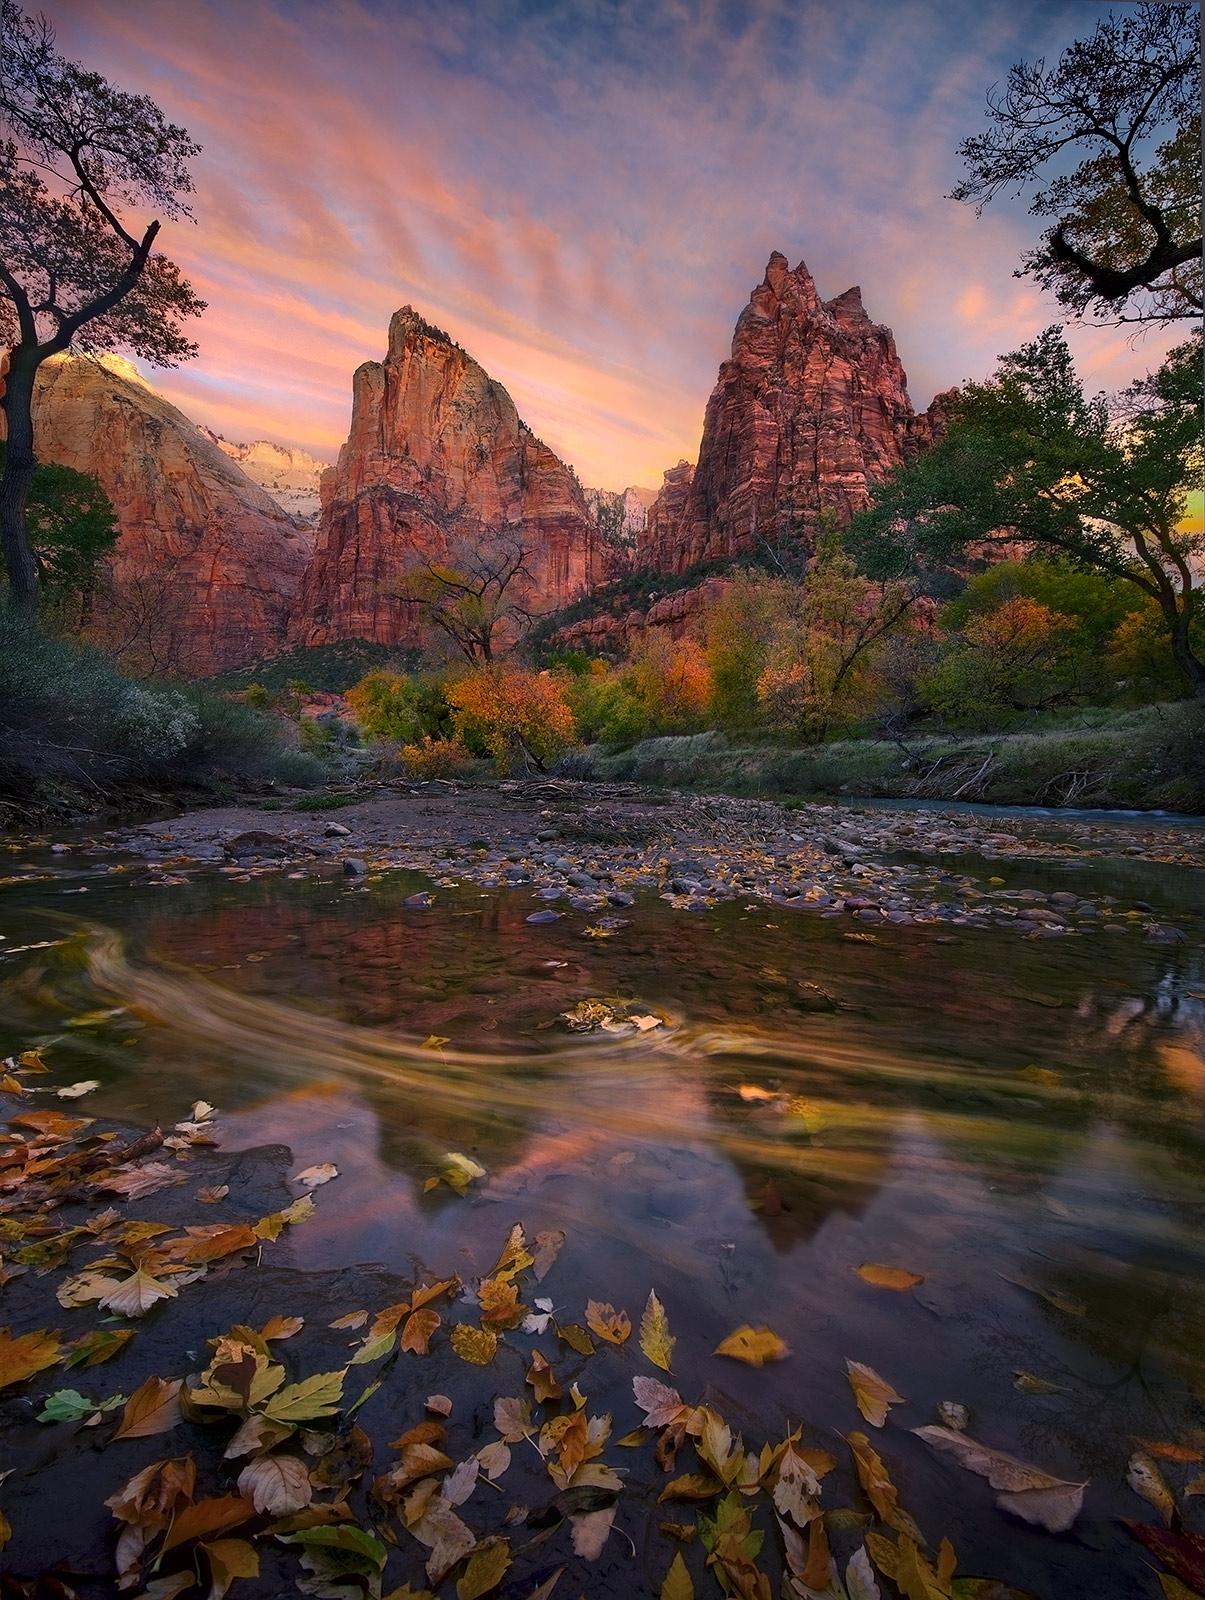 Colorado Fall Wallpaper Mountain Mountain 2010 Court Of The Patriarchs Zion